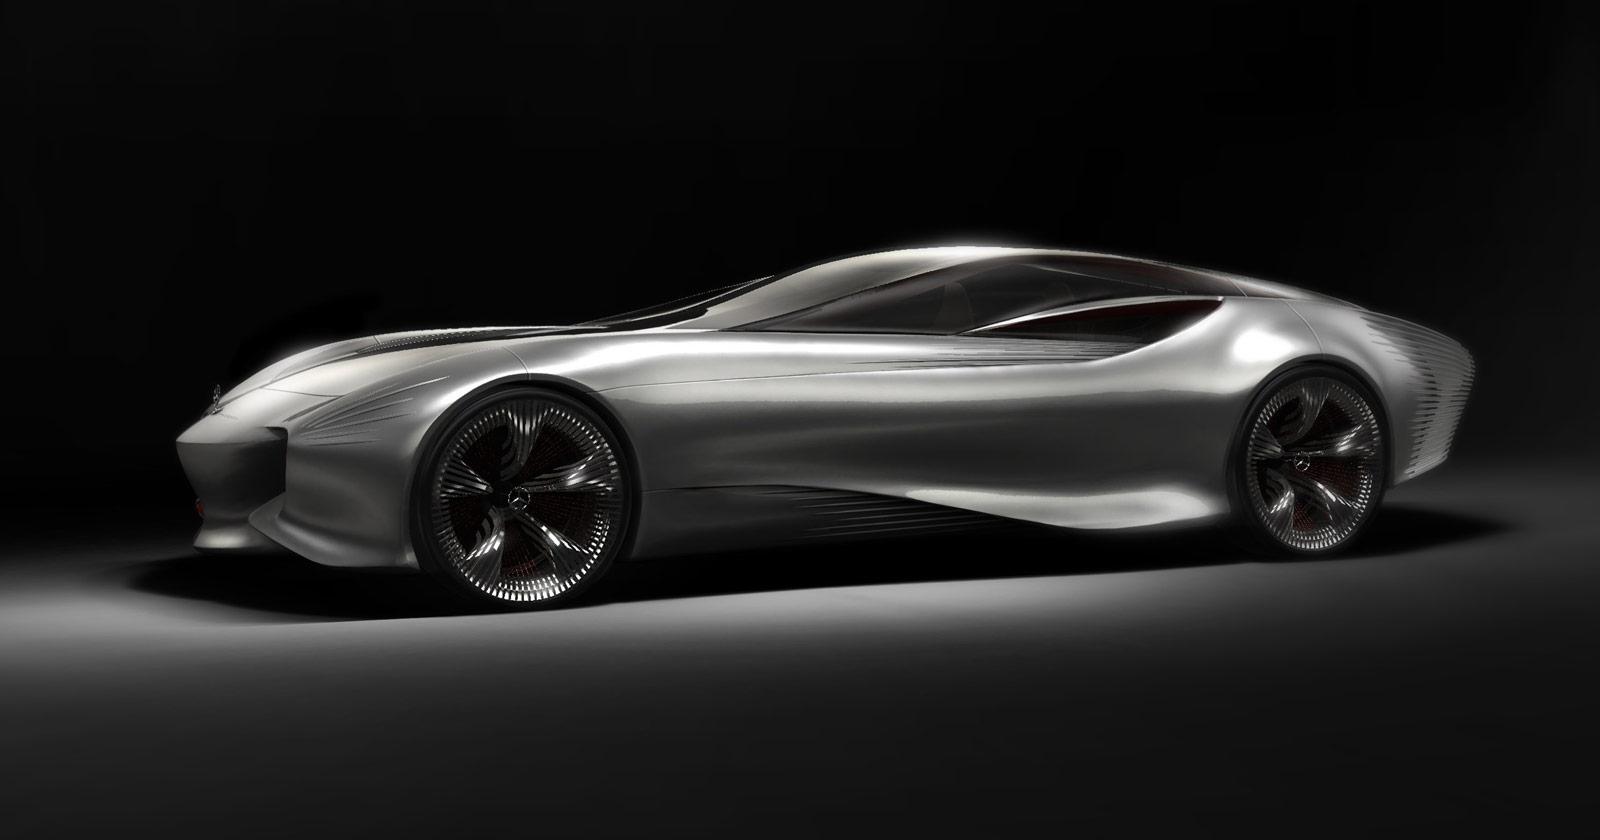 Mercedes benz aria concept electric luxury car for 2030 for Mercedes benz concept electric car